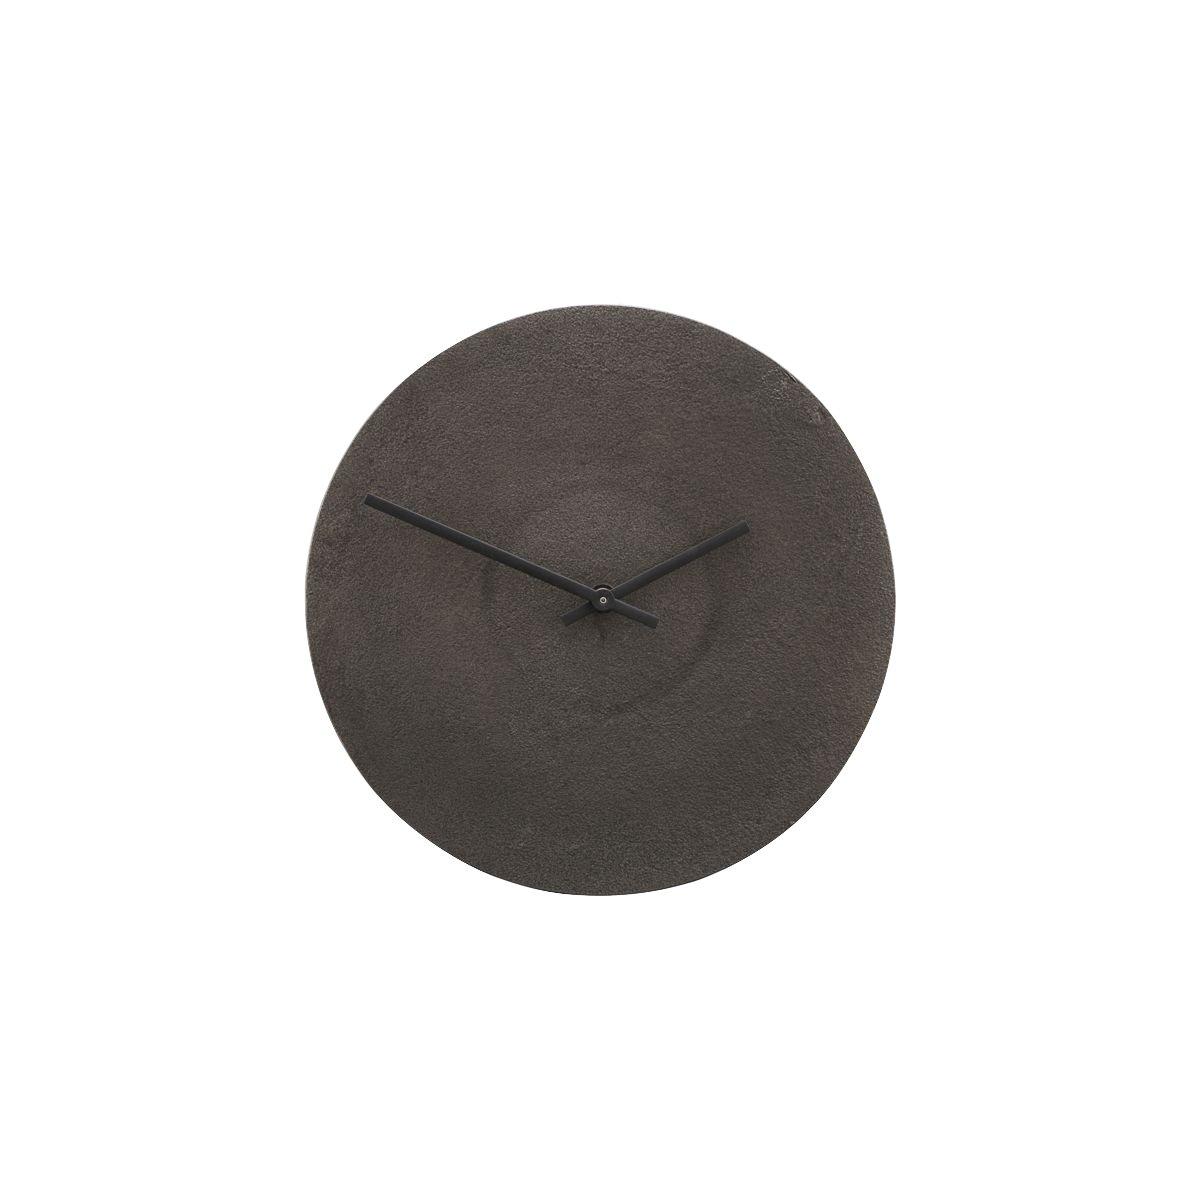 House Doctor - Thrissur Wall Clock Ø 30 cm - Antik Metallisk (206190100/206190100)